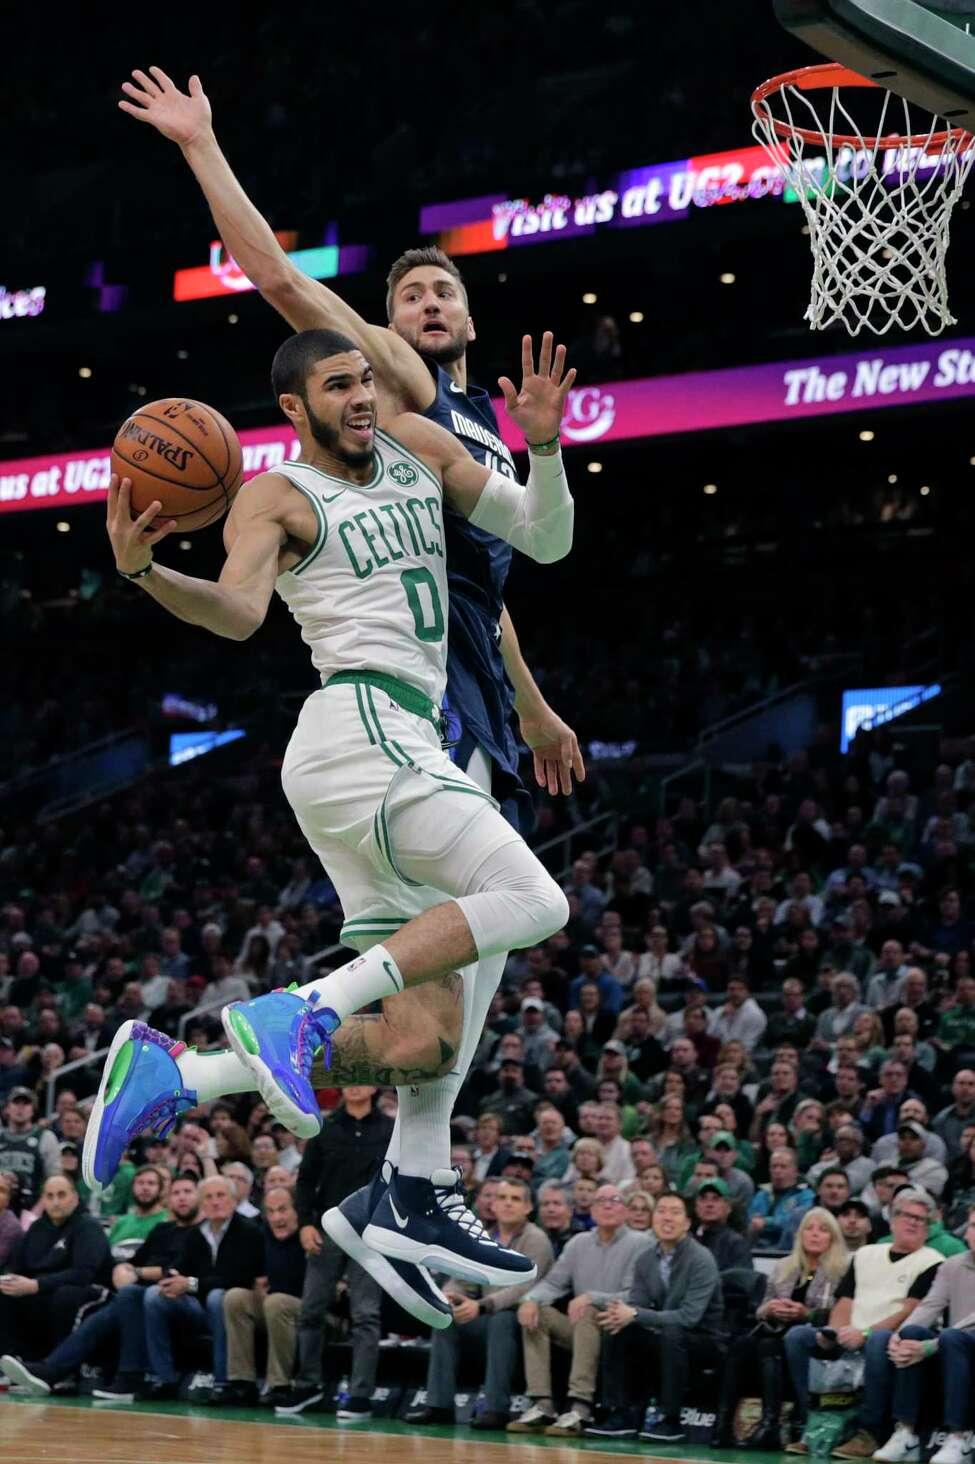 Boston Celtics forward Jayson Tatum (0) drives to the basket against Dallas Mavericks center Maxi Kleber, rear, during the first quarter of an NBA basketball game in Boston, Monday, Nov. 11, 2019. (AP Photo/Charles Krupa)